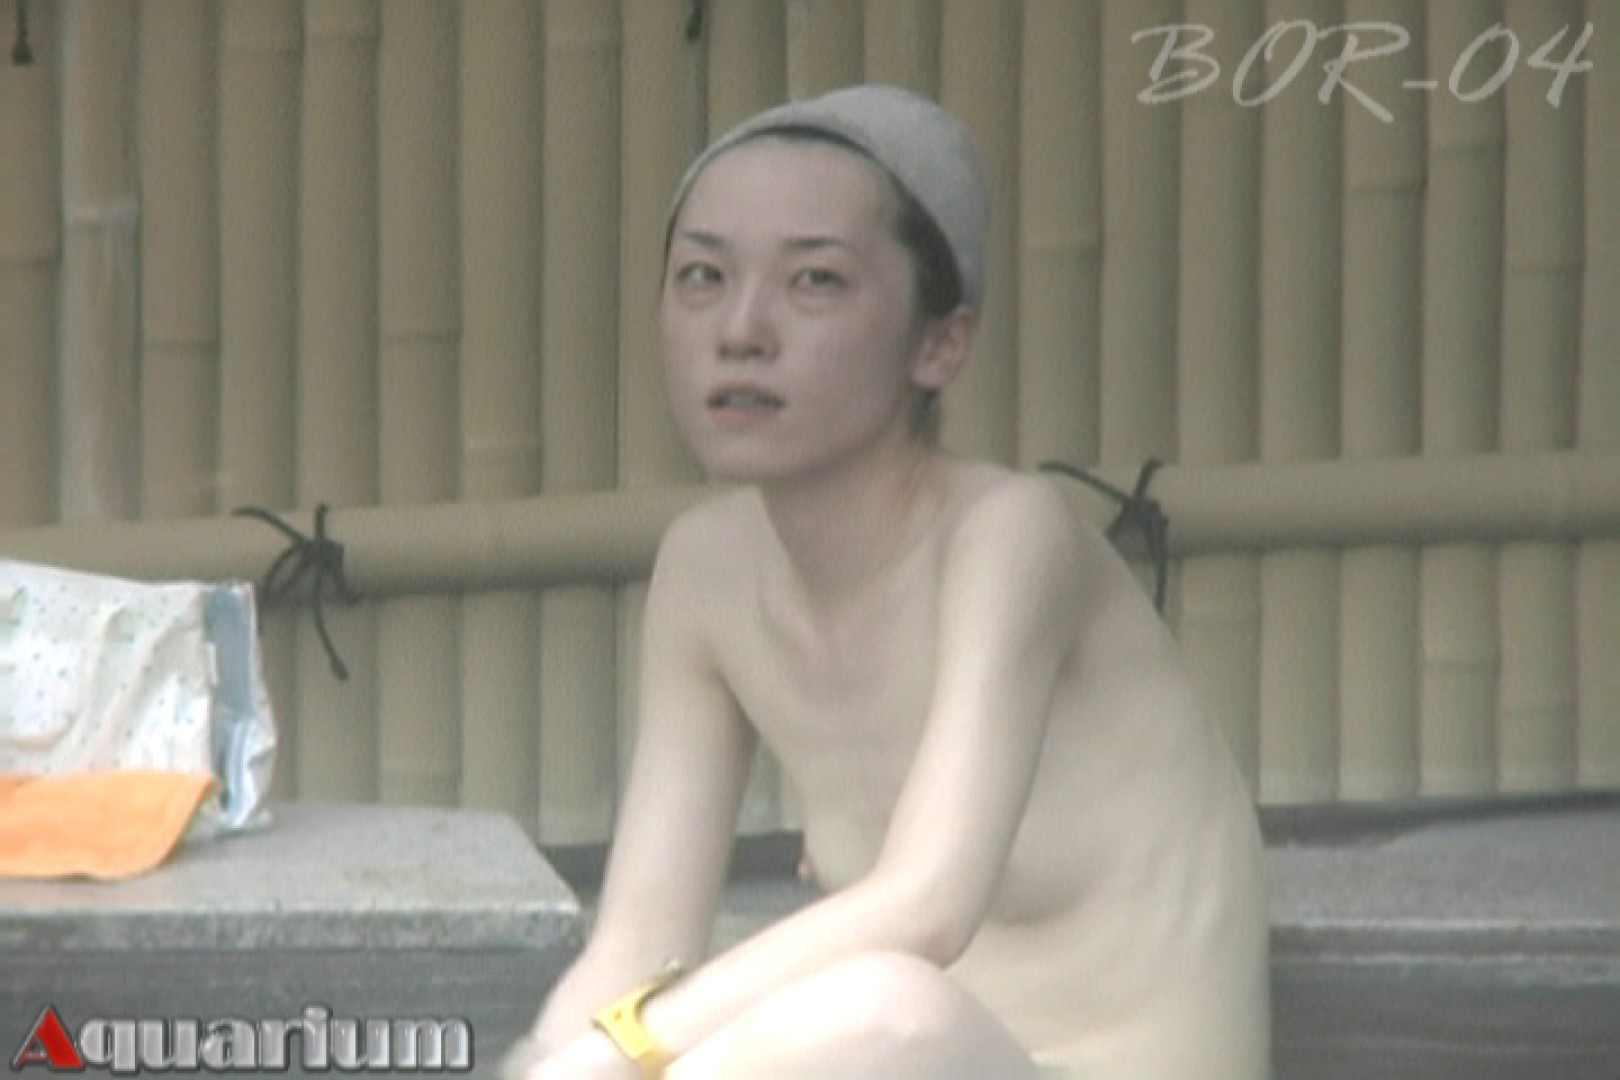 Aquaな露天風呂Vol.510 エッチな盗撮 オマンコ無修正動画無料 110pic 75